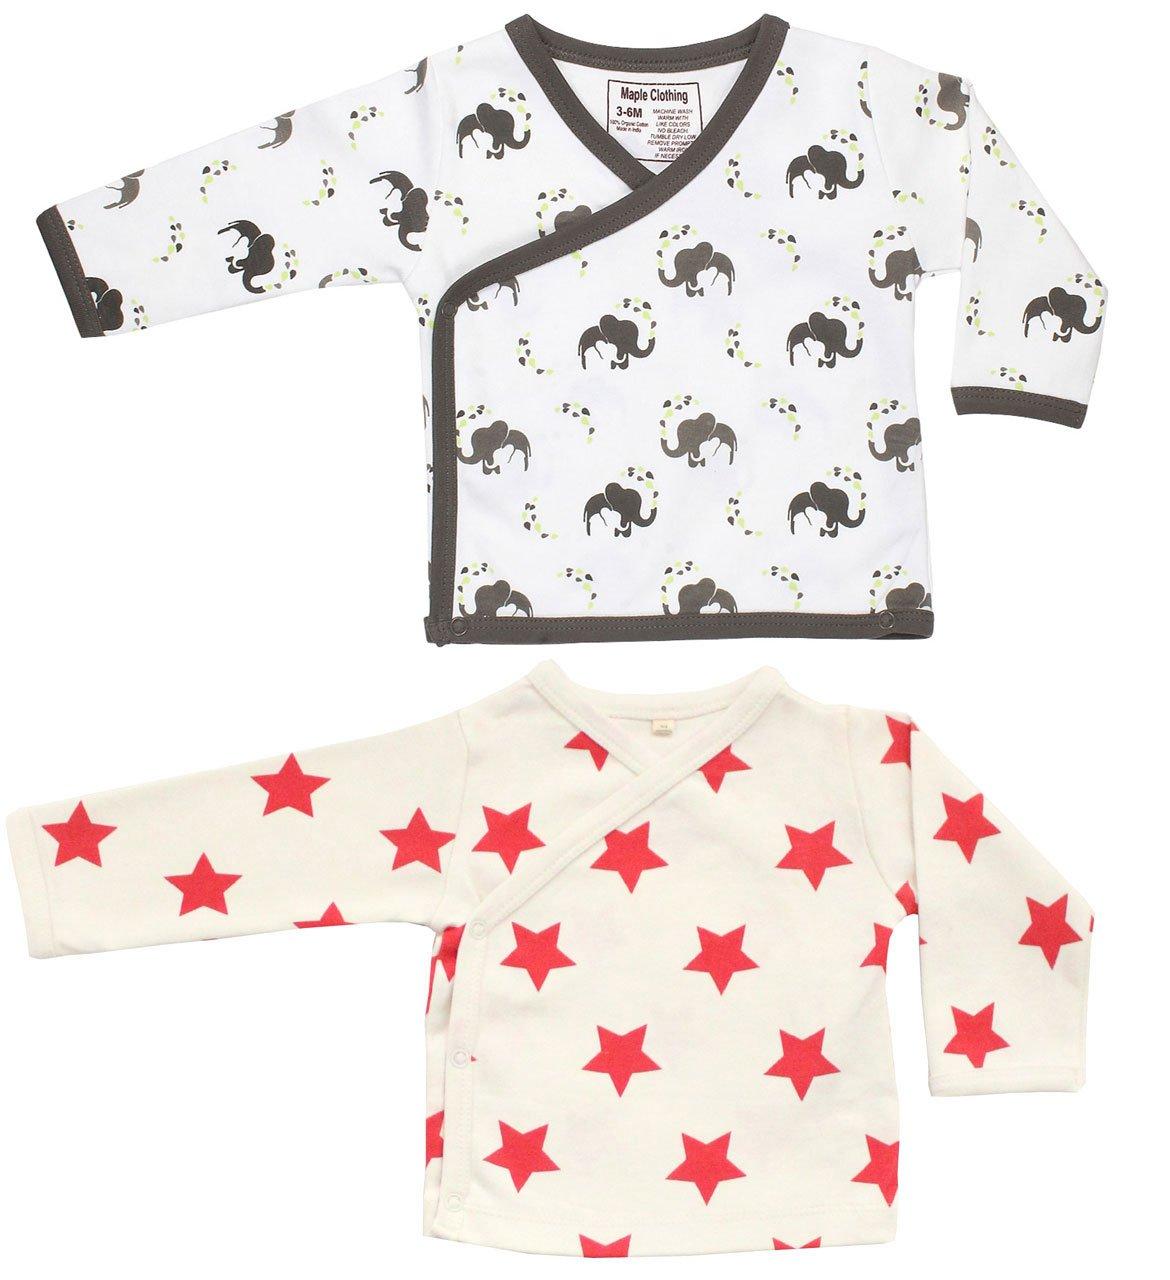 Maple Clothing Organic Cotton Baby Kimono GOTS